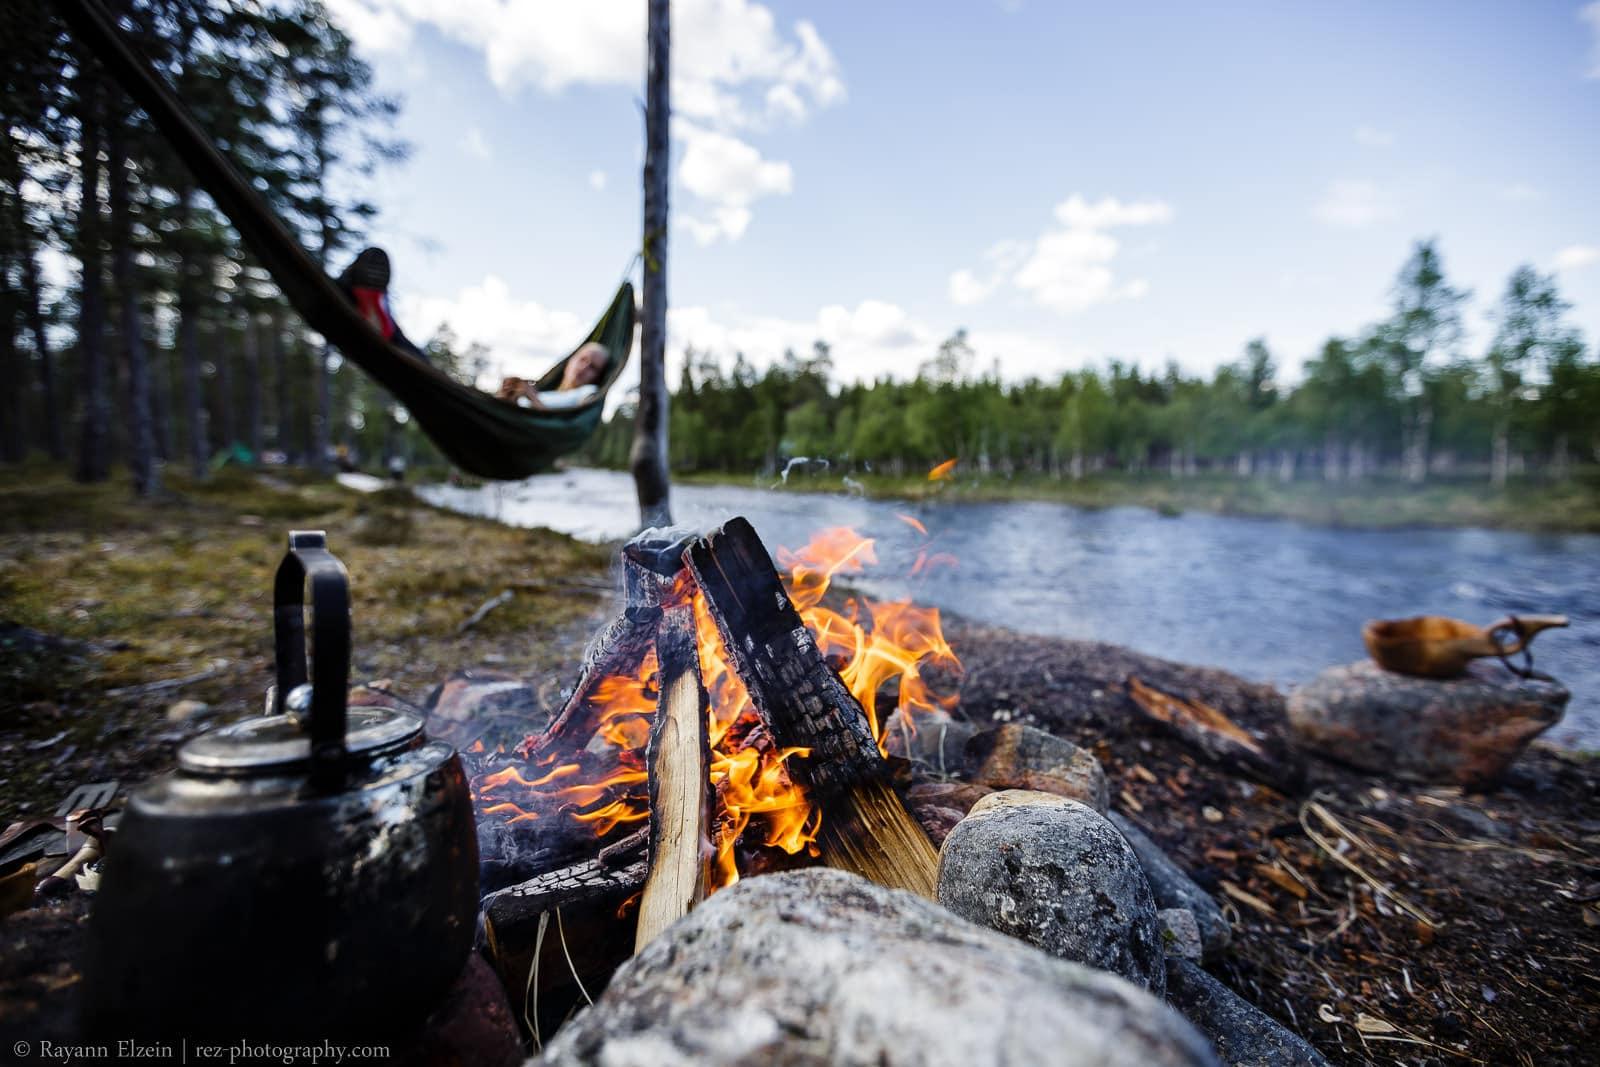 Lapland Summer Pictures Rayann Elzein Photography